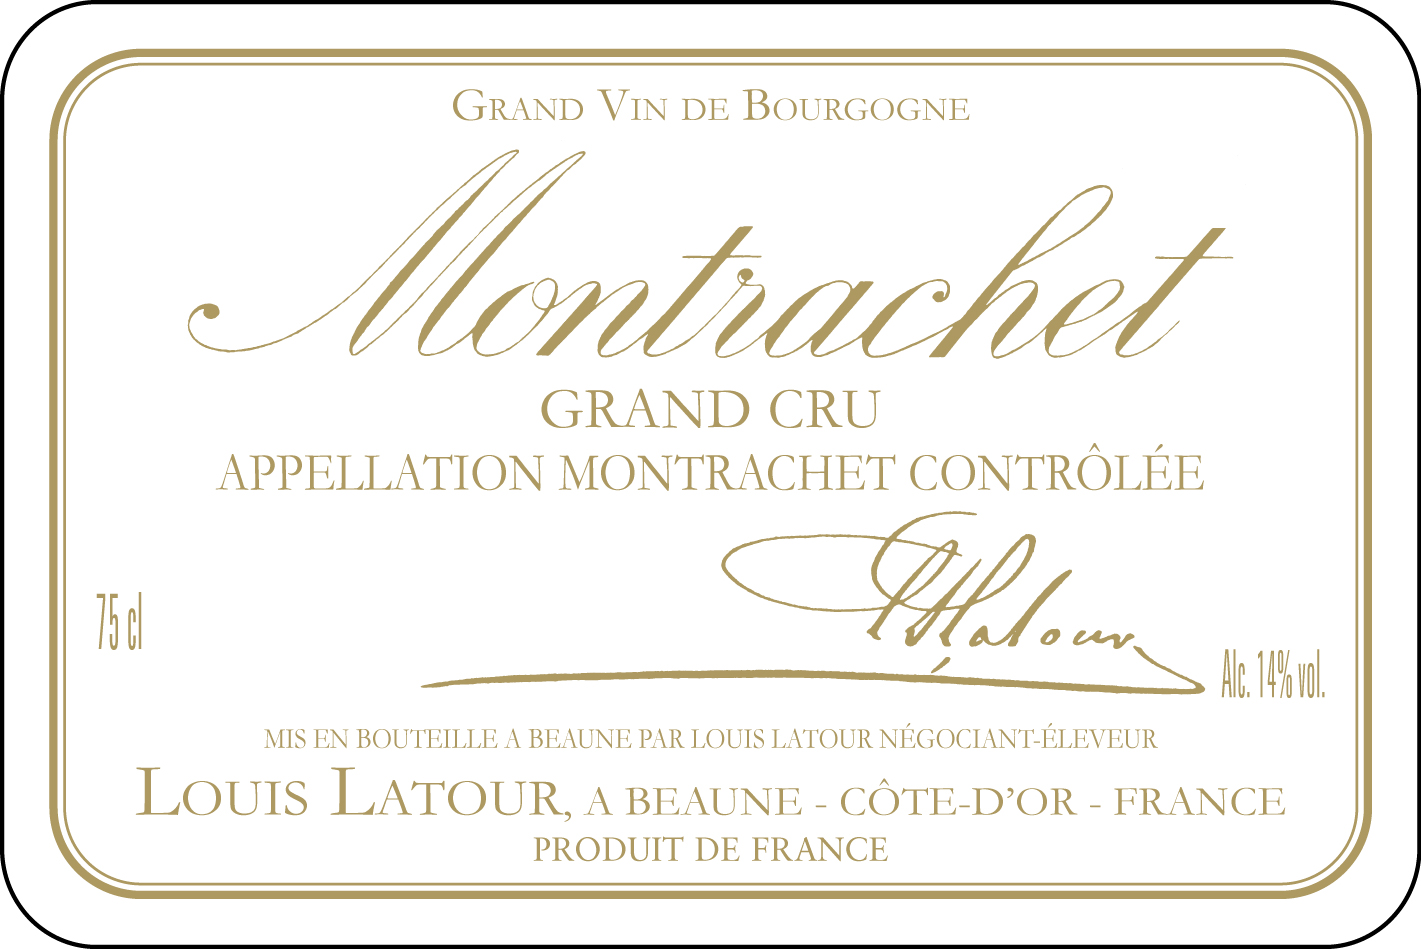 Fabuleux Montrachet Grand Cru - Maison Louis Latour KJ25